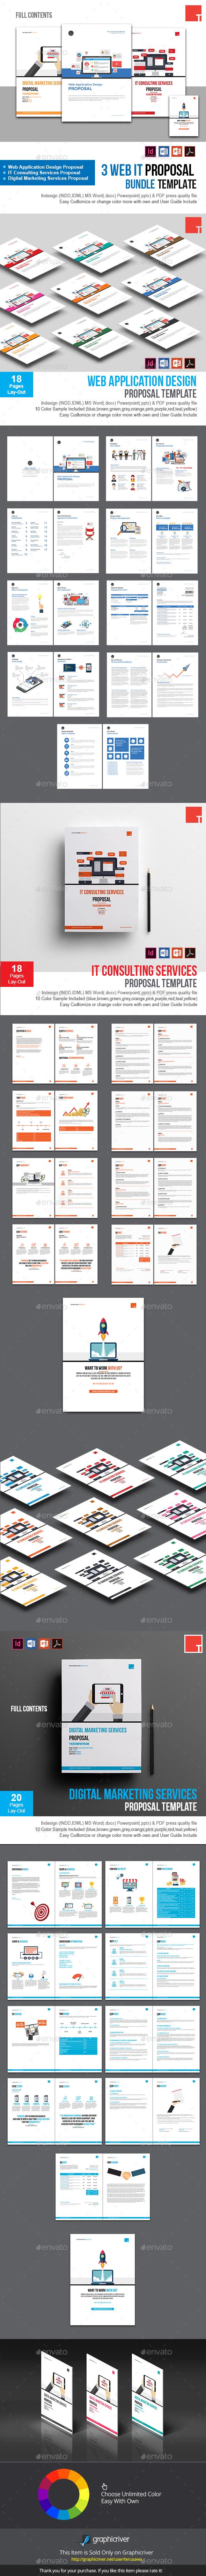 3 Web IT Proposal Bundle Template - Proposals & Invoices Stationery